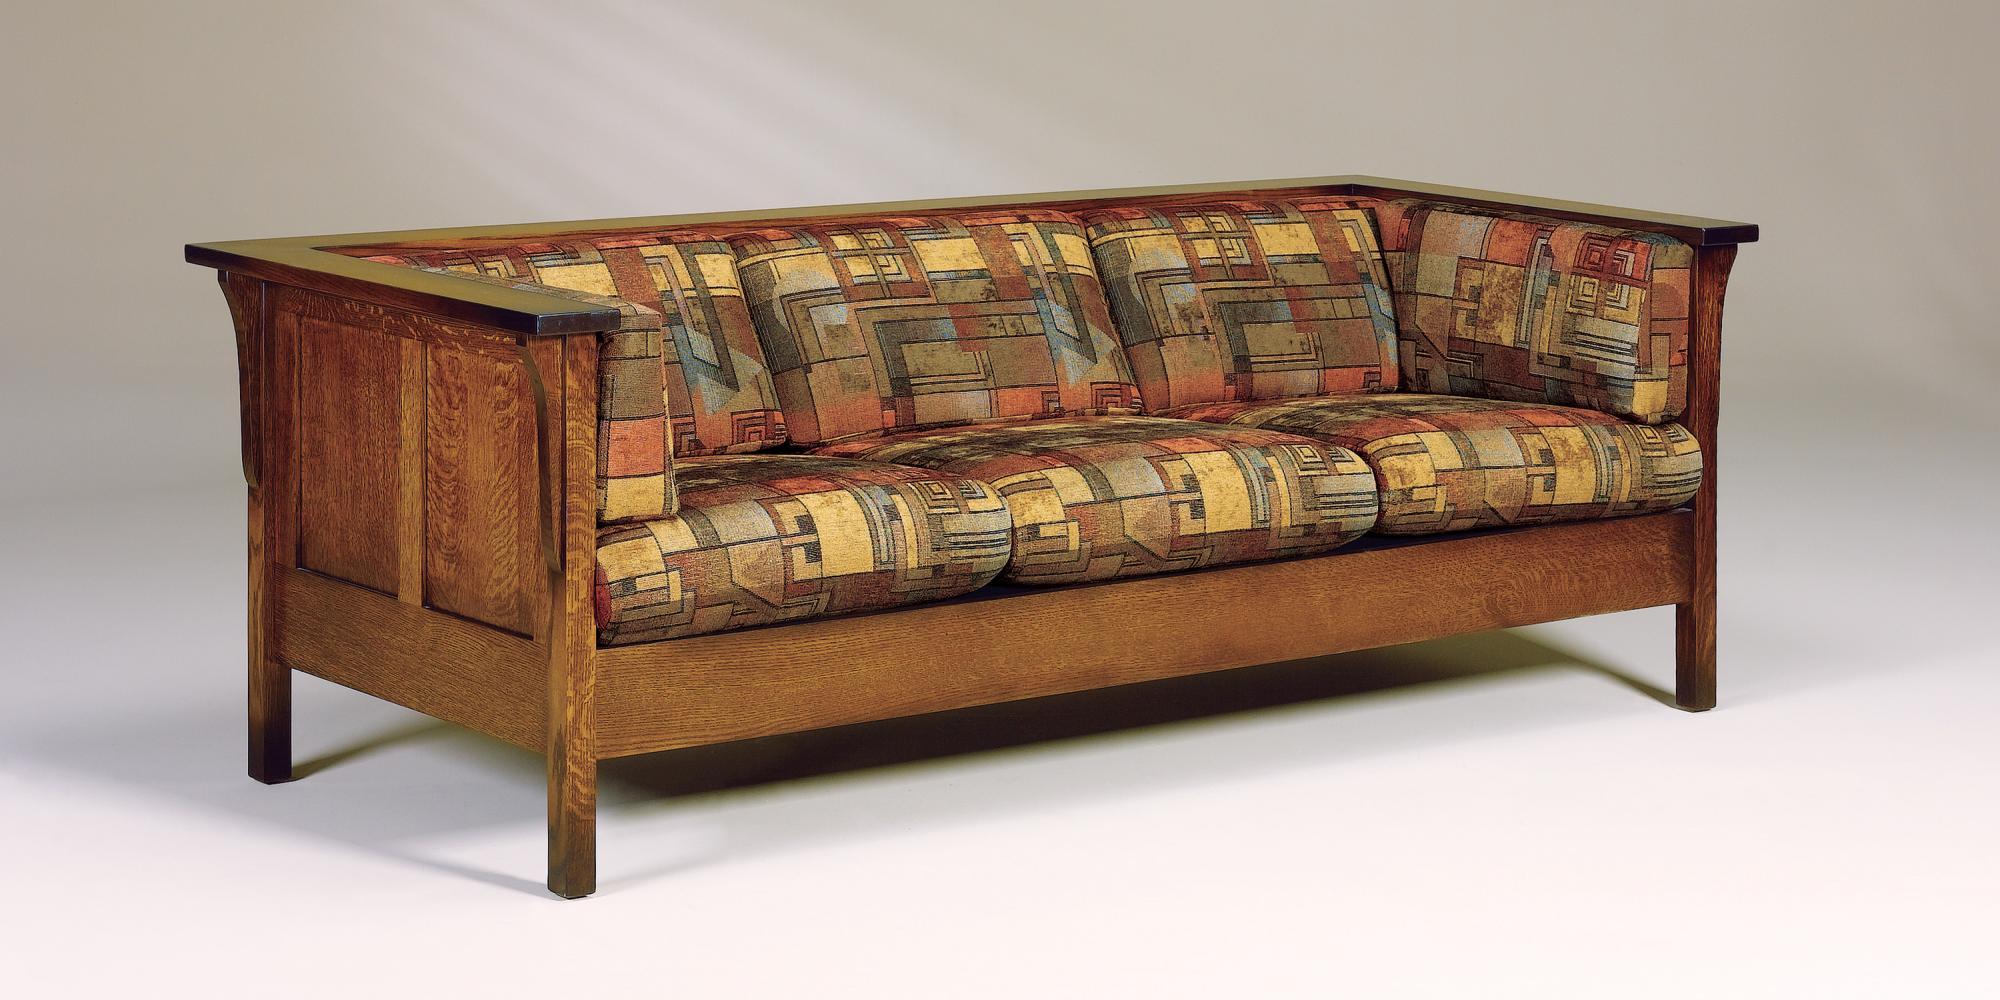 Fine Cubic Living Room Amish Furniture For Mankato Mn Download Free Architecture Designs Scobabritishbridgeorg